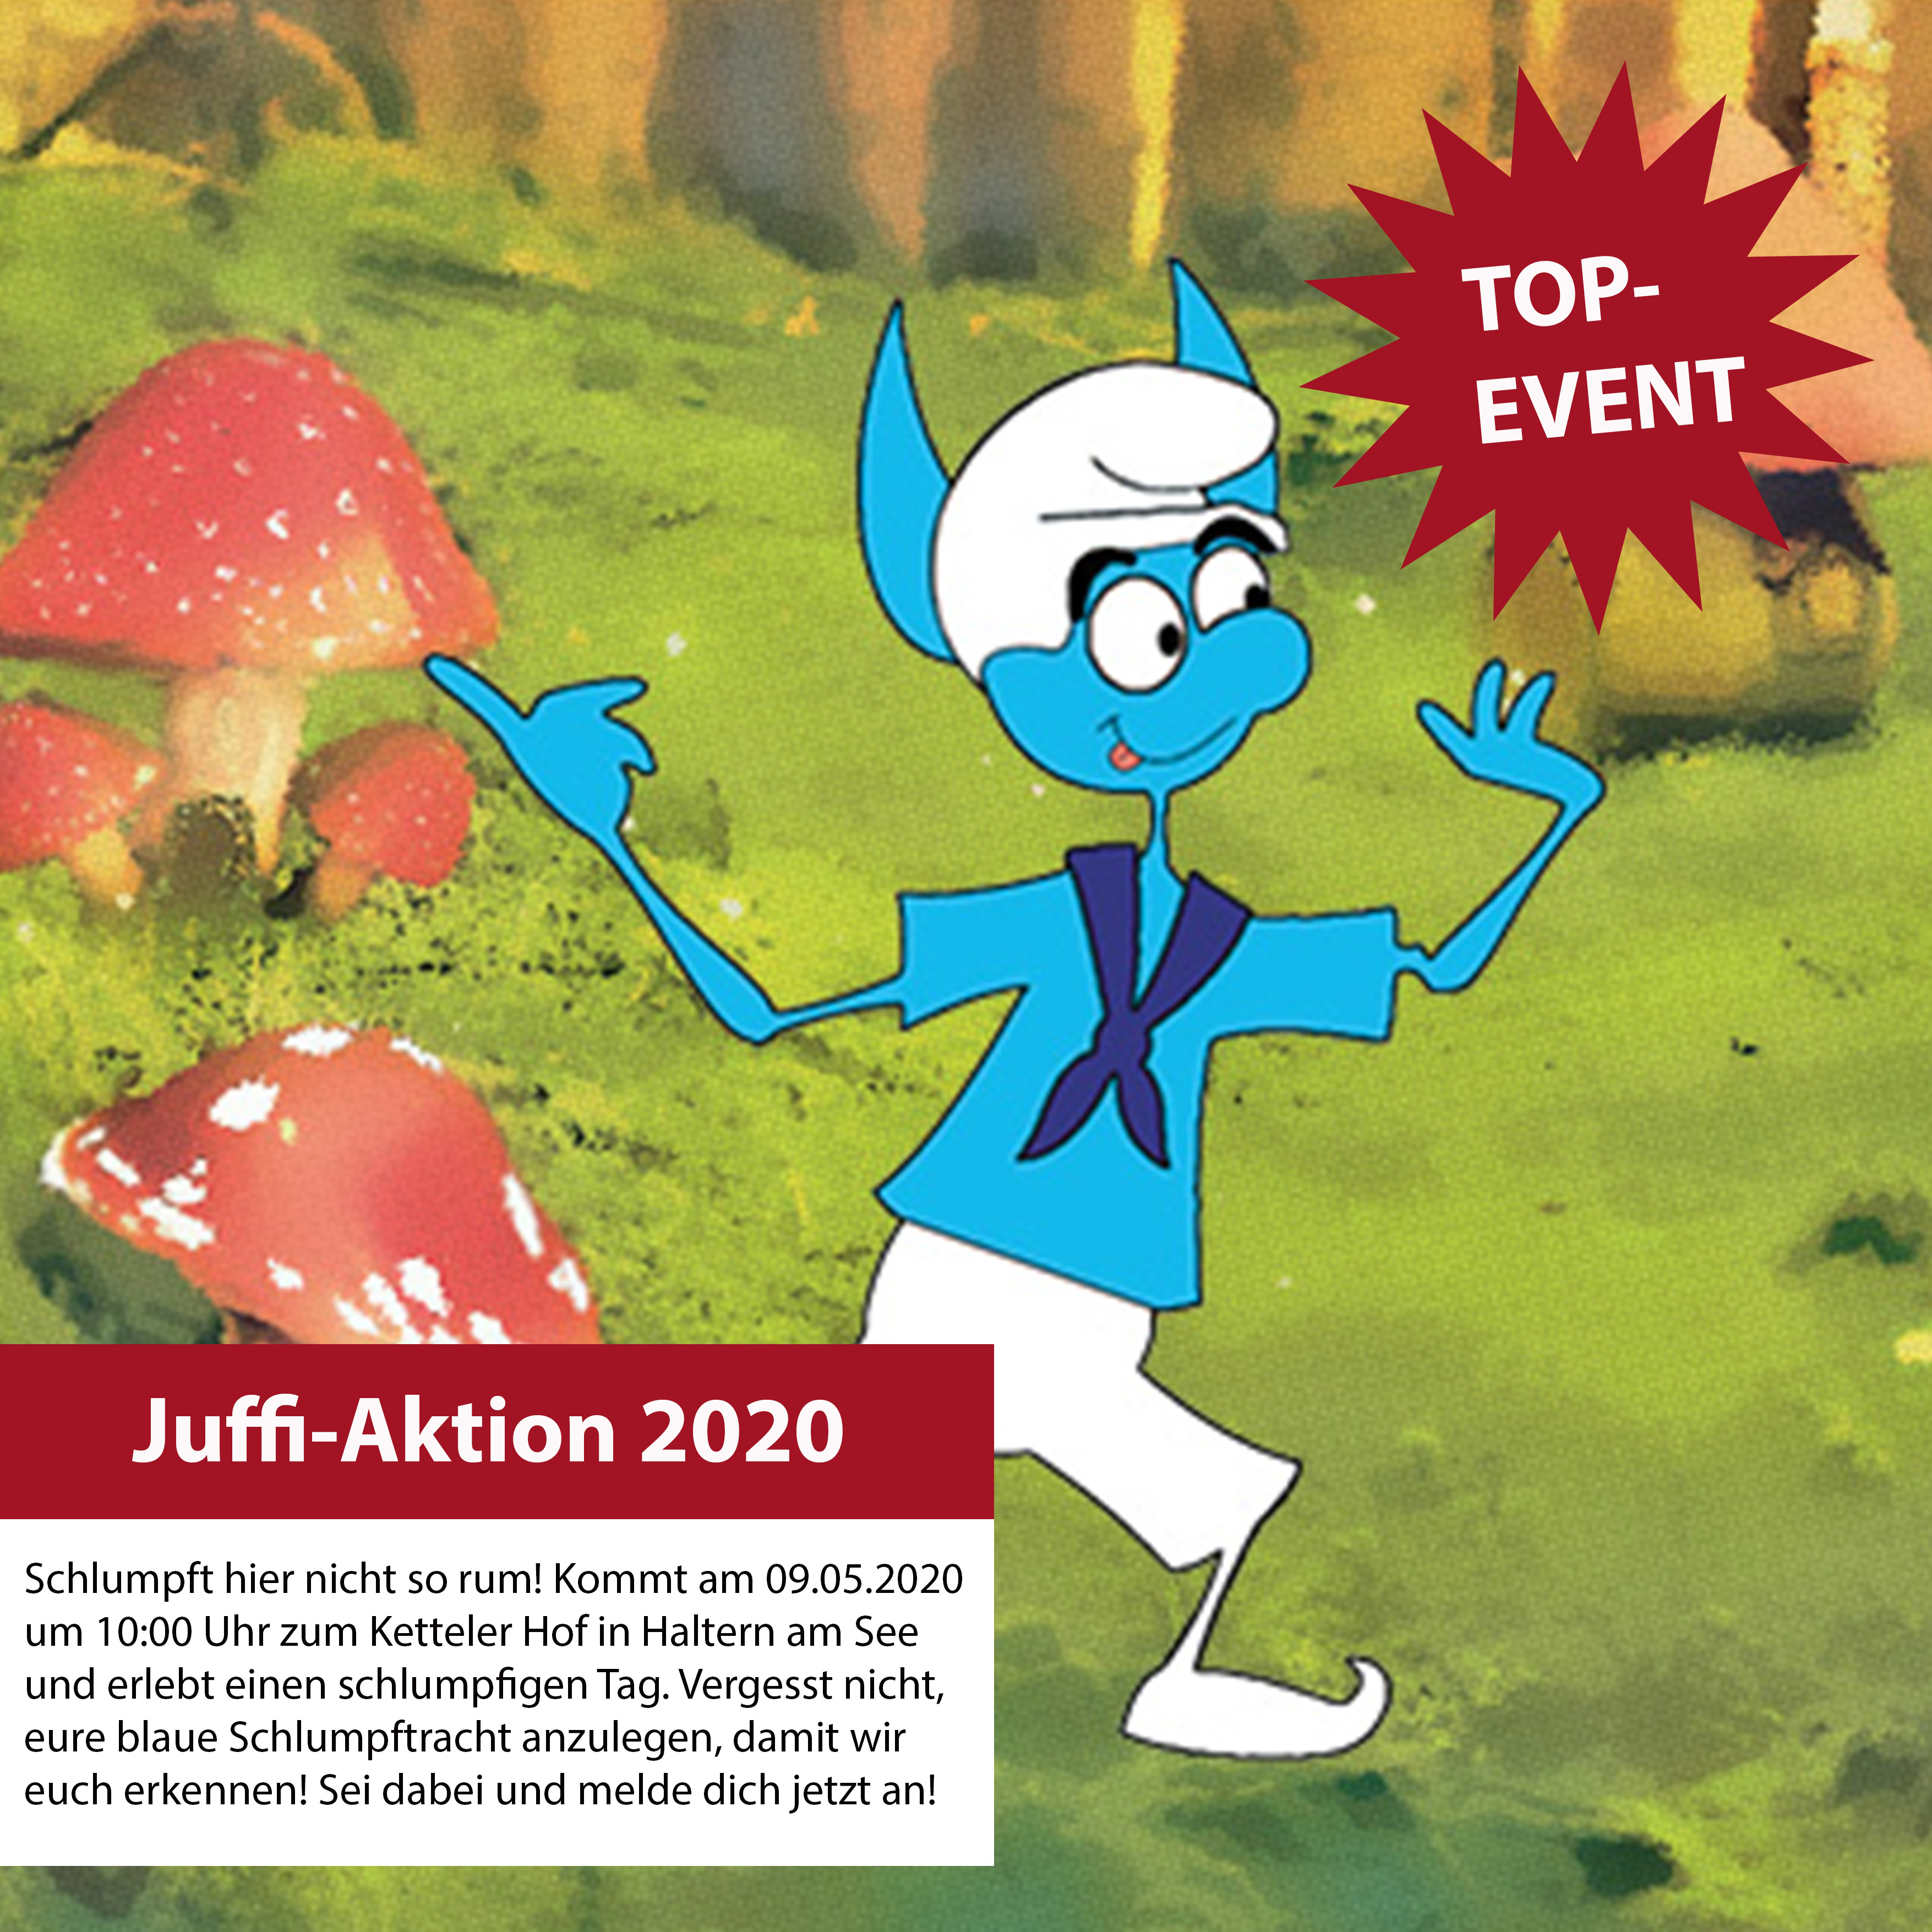 Top-Event_Juffi_Aktion_2020.jpg